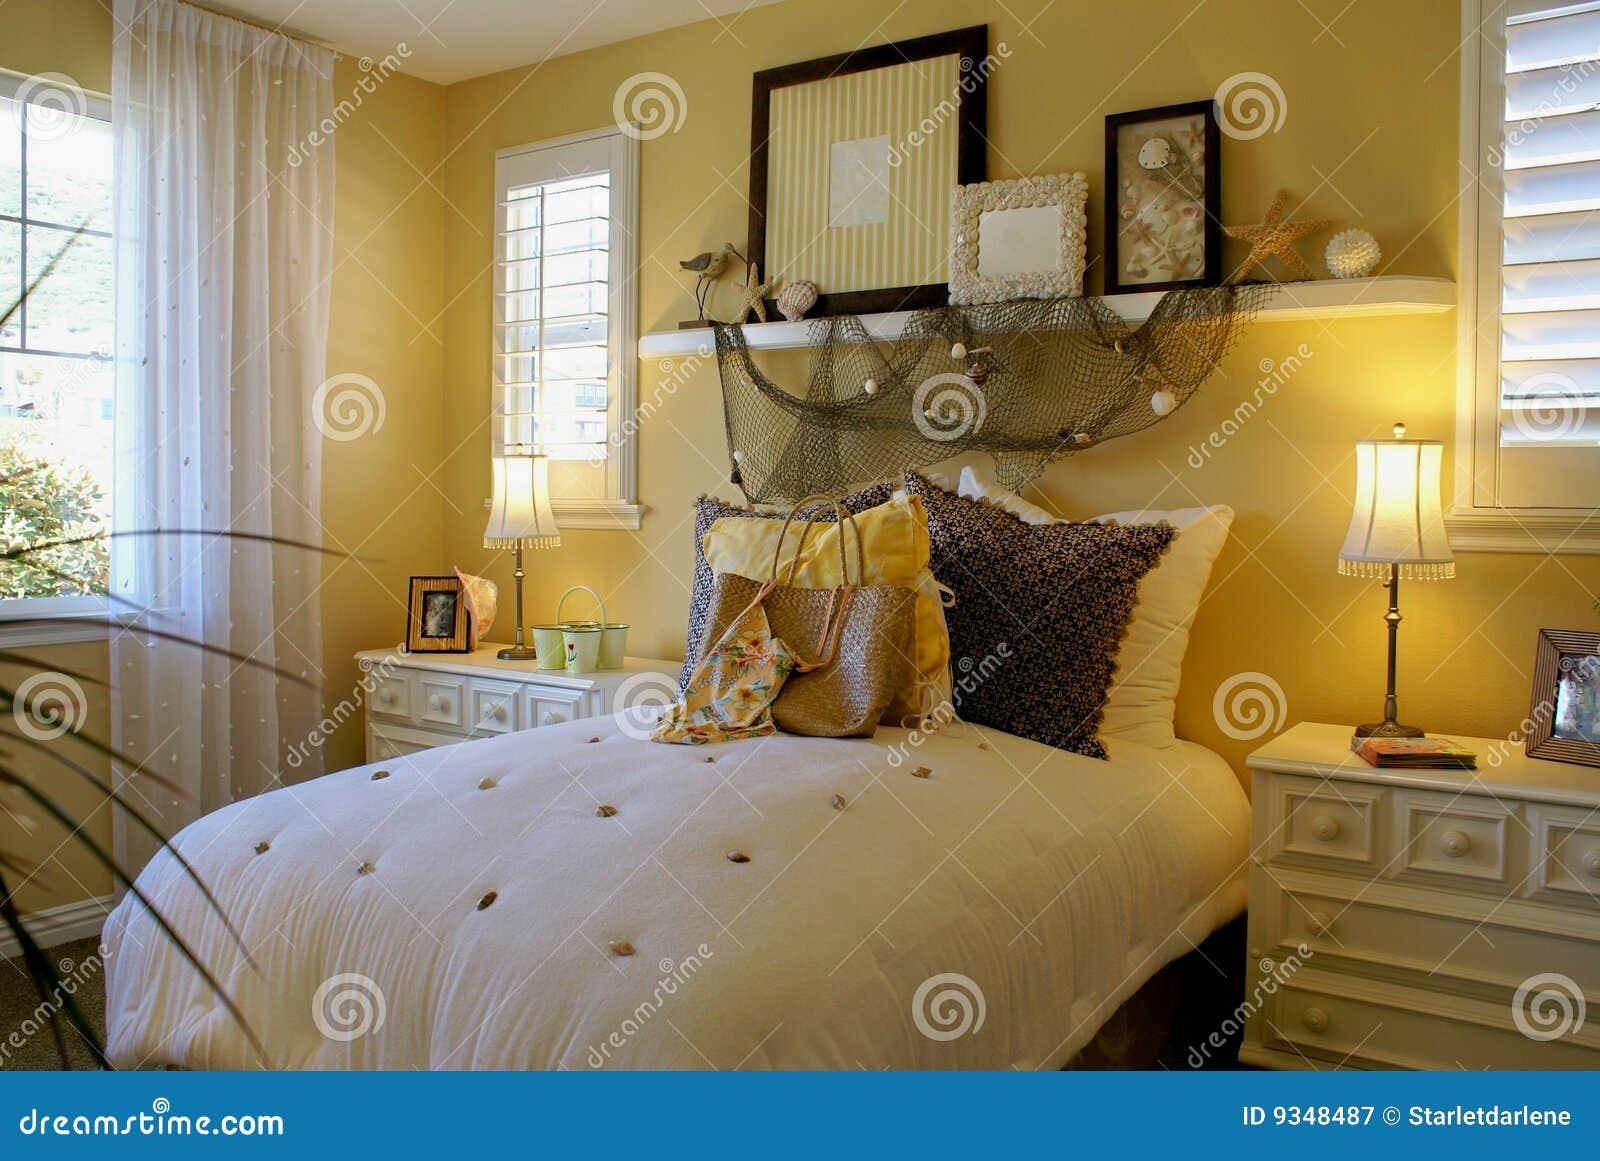 Yellow Bed Room Beach Decor Stock Image Image Of Yellow